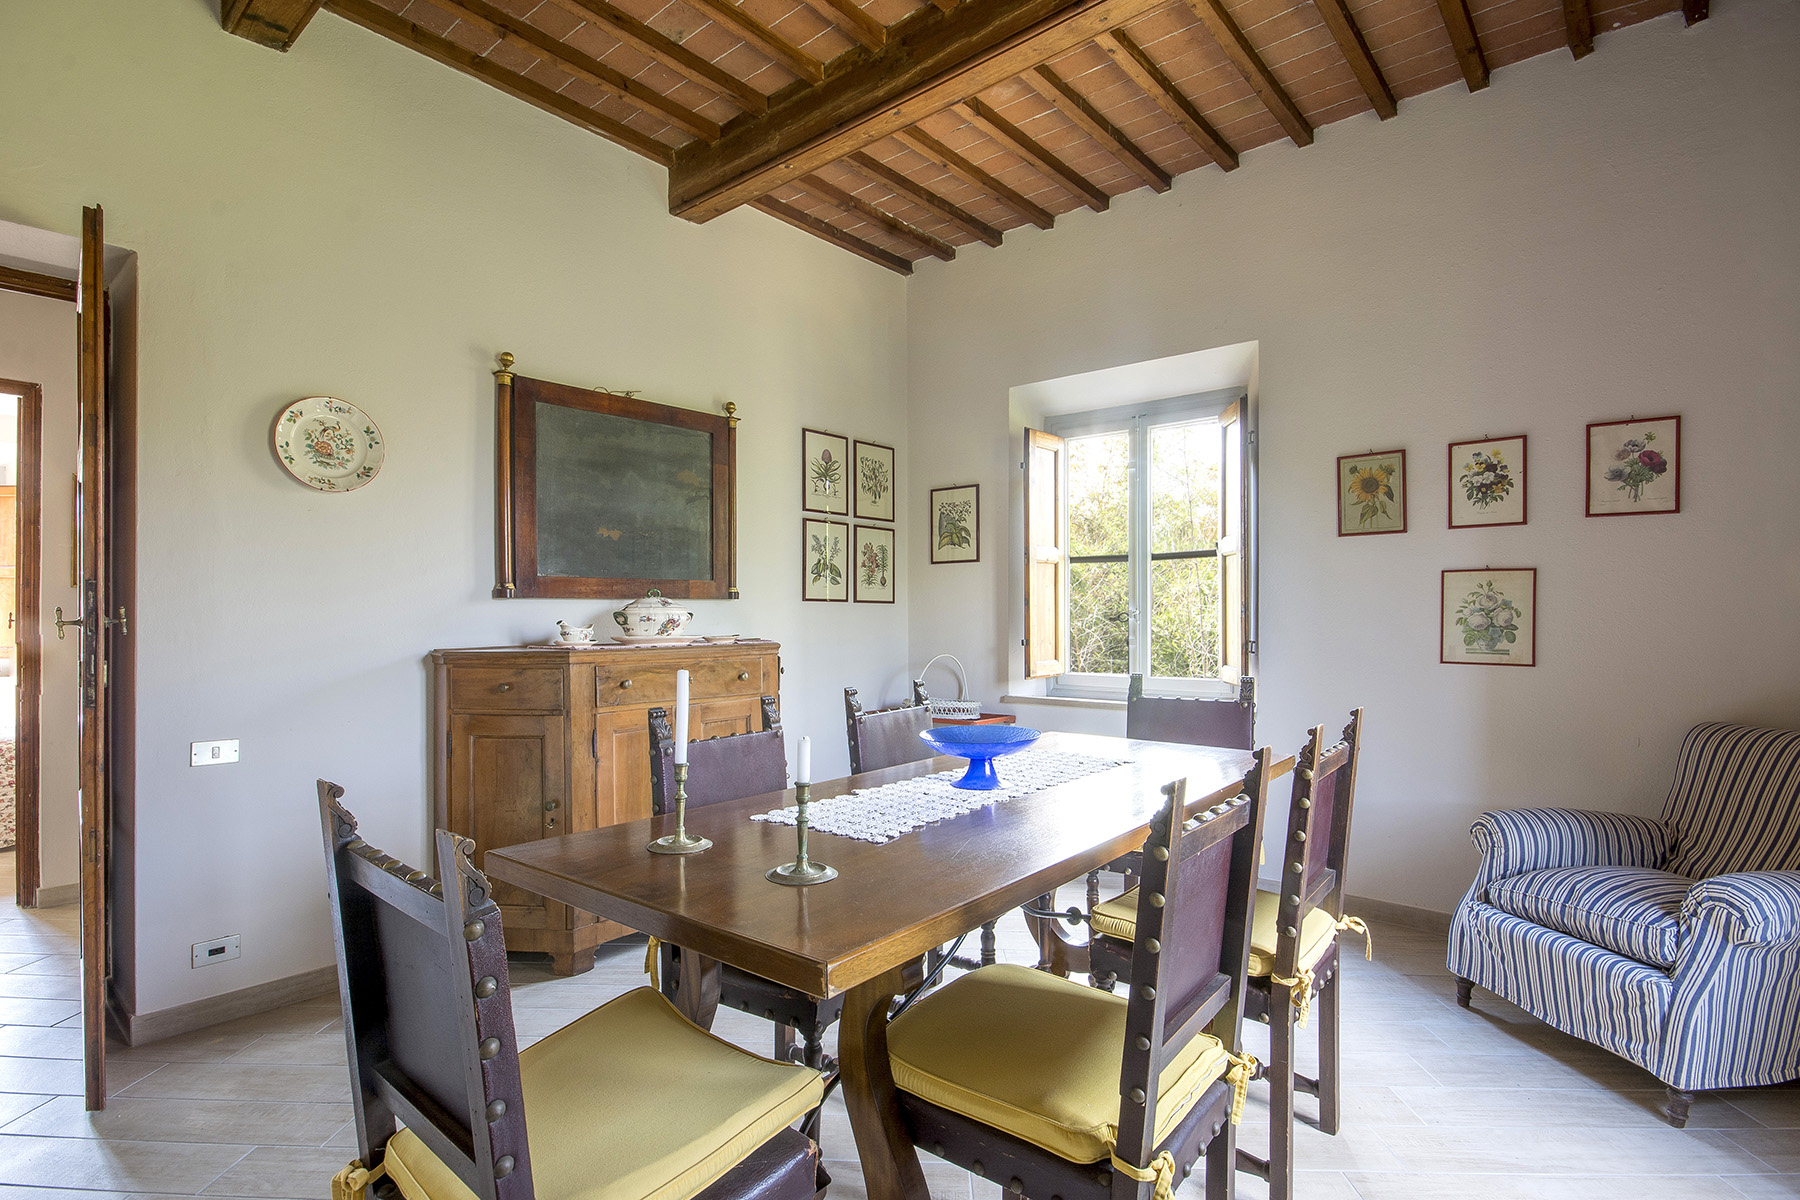 Villa in Vendita a Lucca: 5 locali, 1150 mq - Foto 6